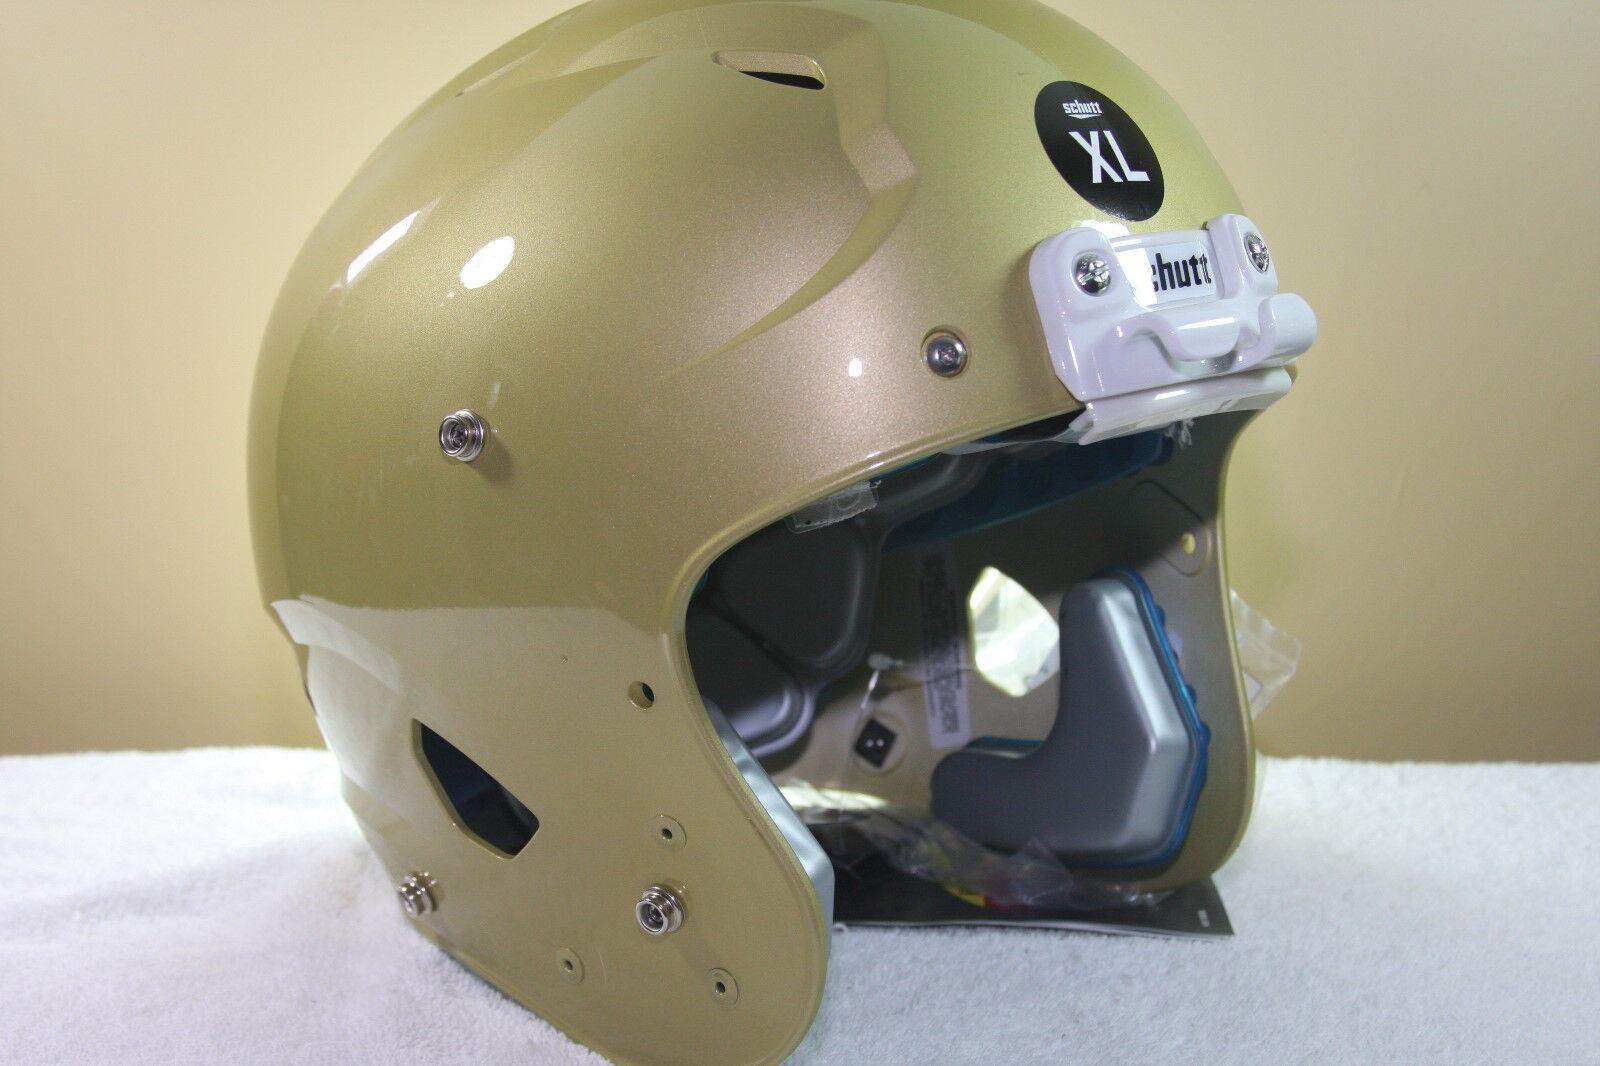 Schutt YOUTH Football Helmet VENGEANCE Metallic 213 oro Nuovo 2017 X-Large XL 213 Metallic e914a2